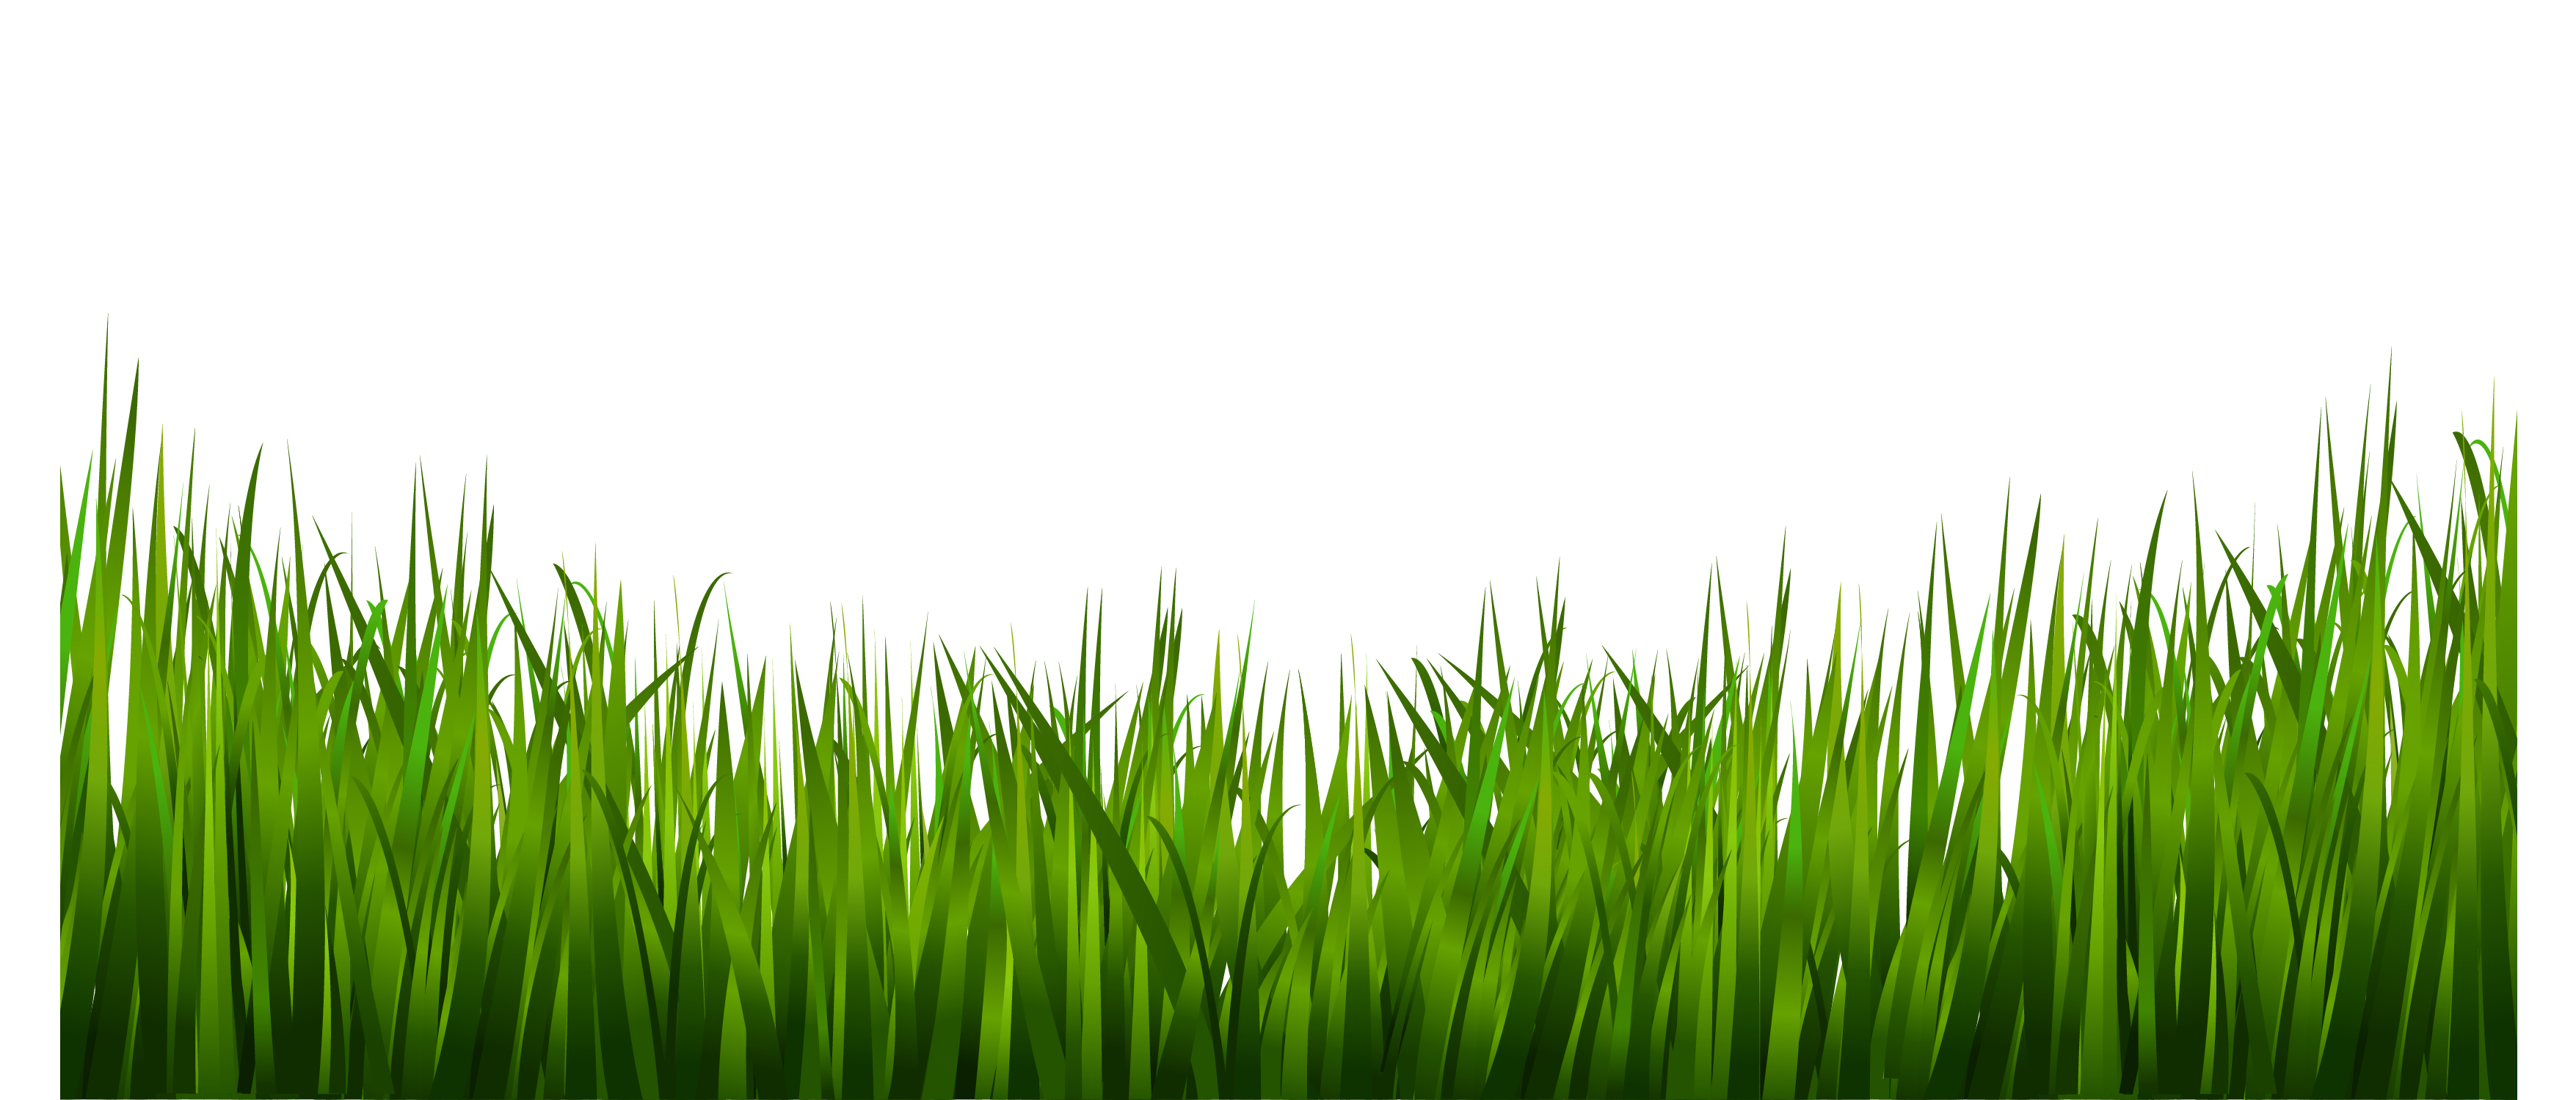 Png images a live. Clipart grass grassland